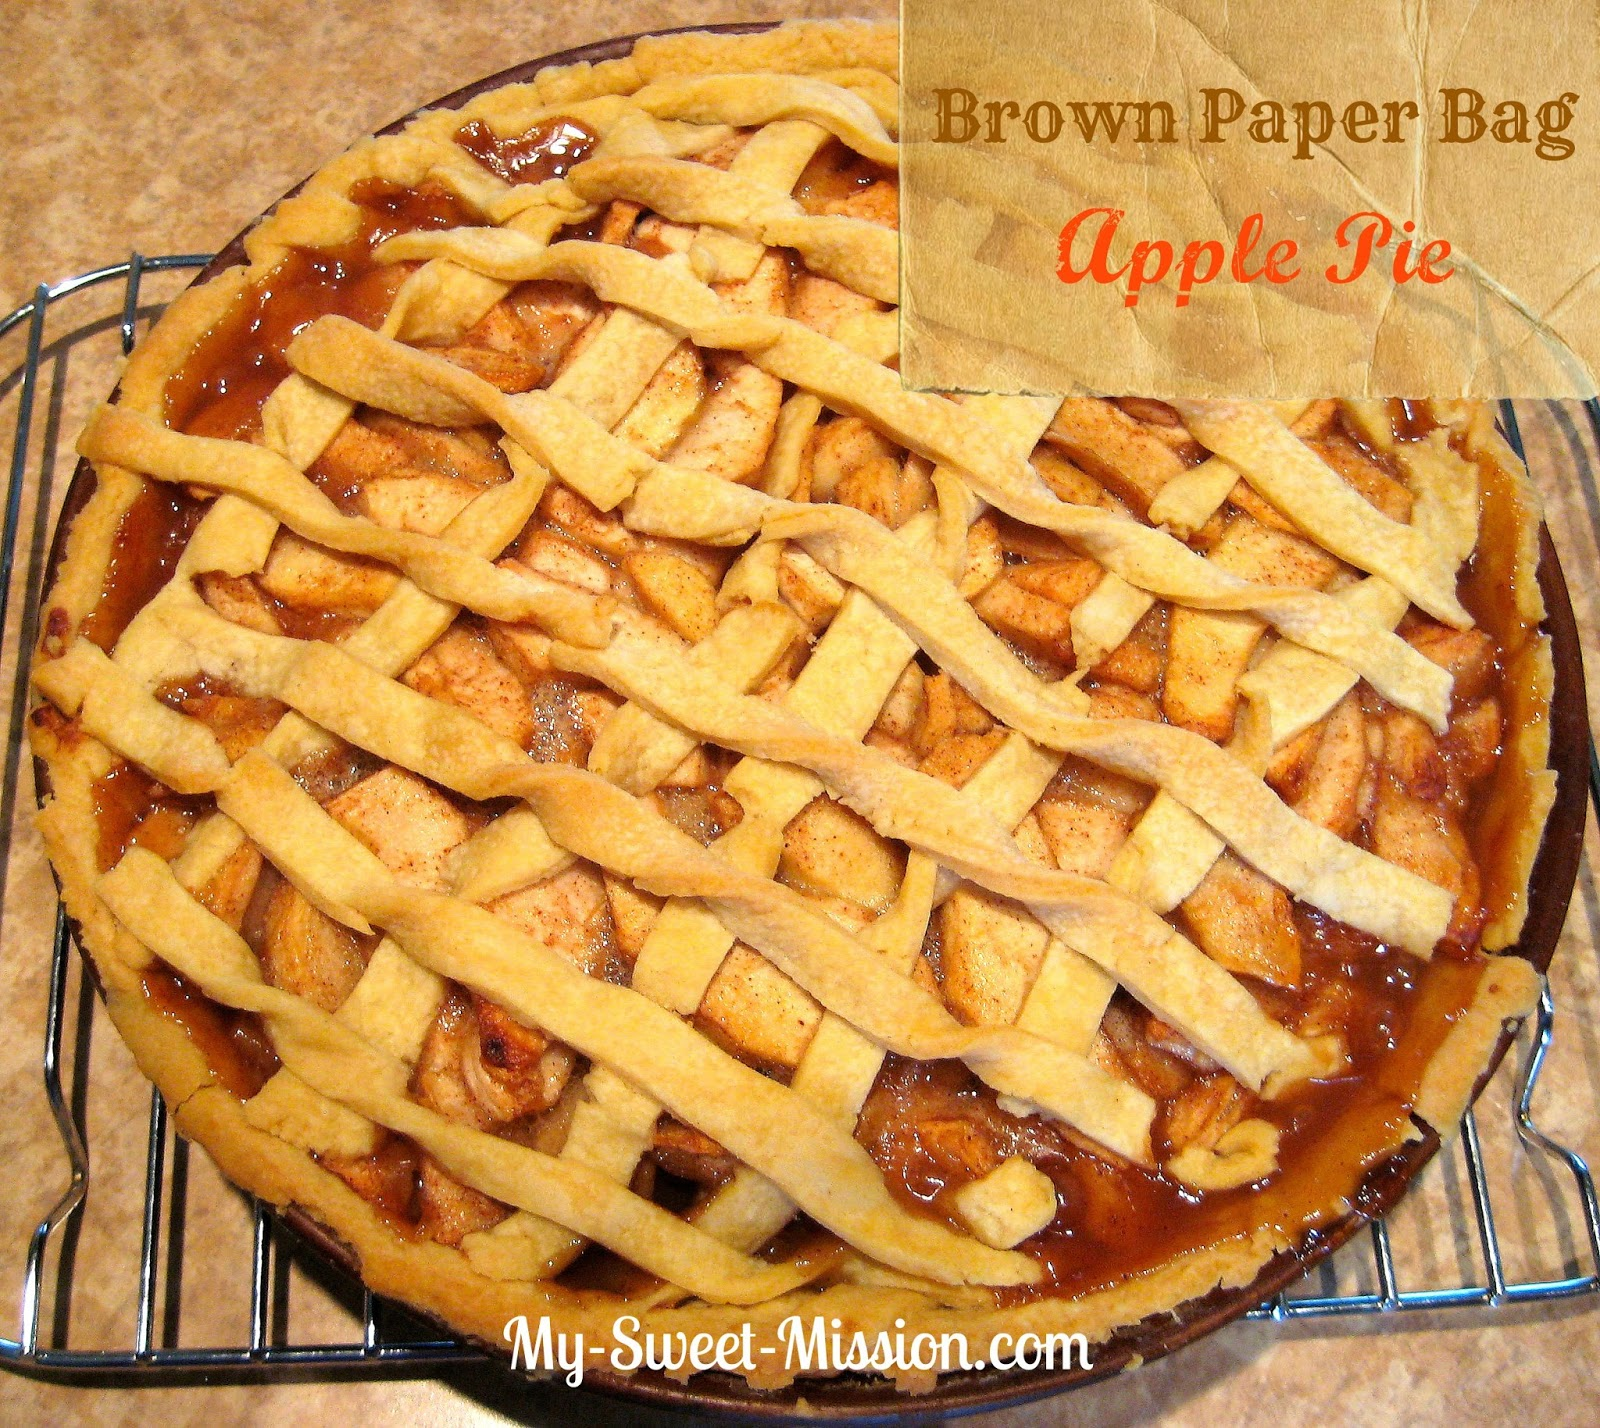 Brown Paper Bag Apple Pie at MySweetMission.net